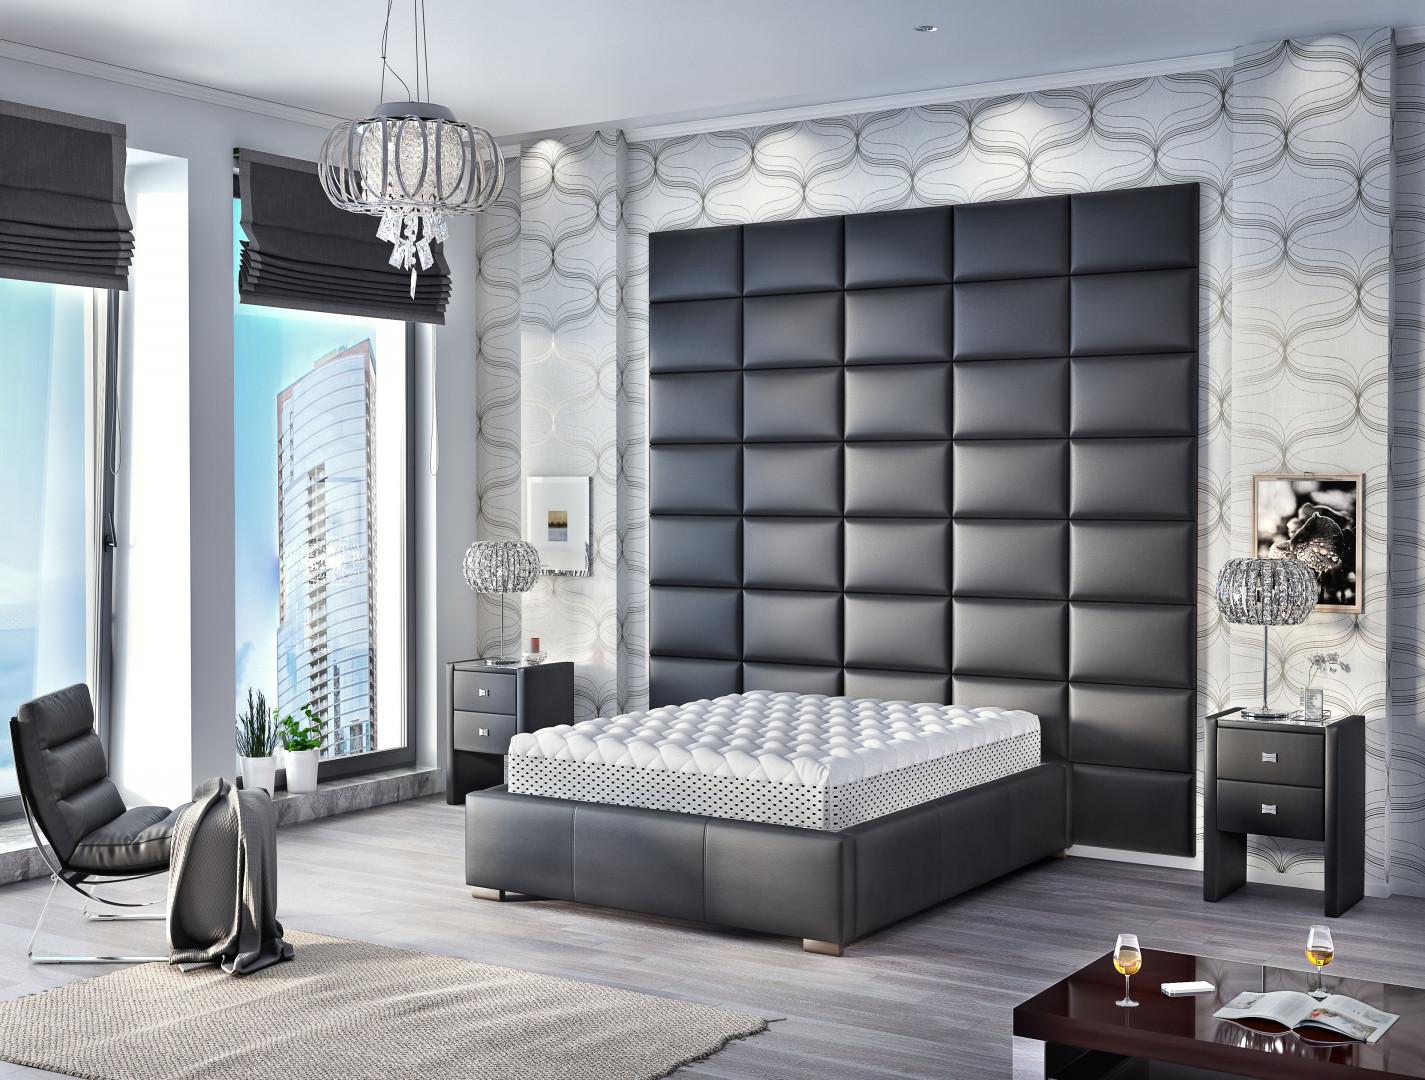 Łóżko Polibox marki Comforteo. Fot.Comforteo